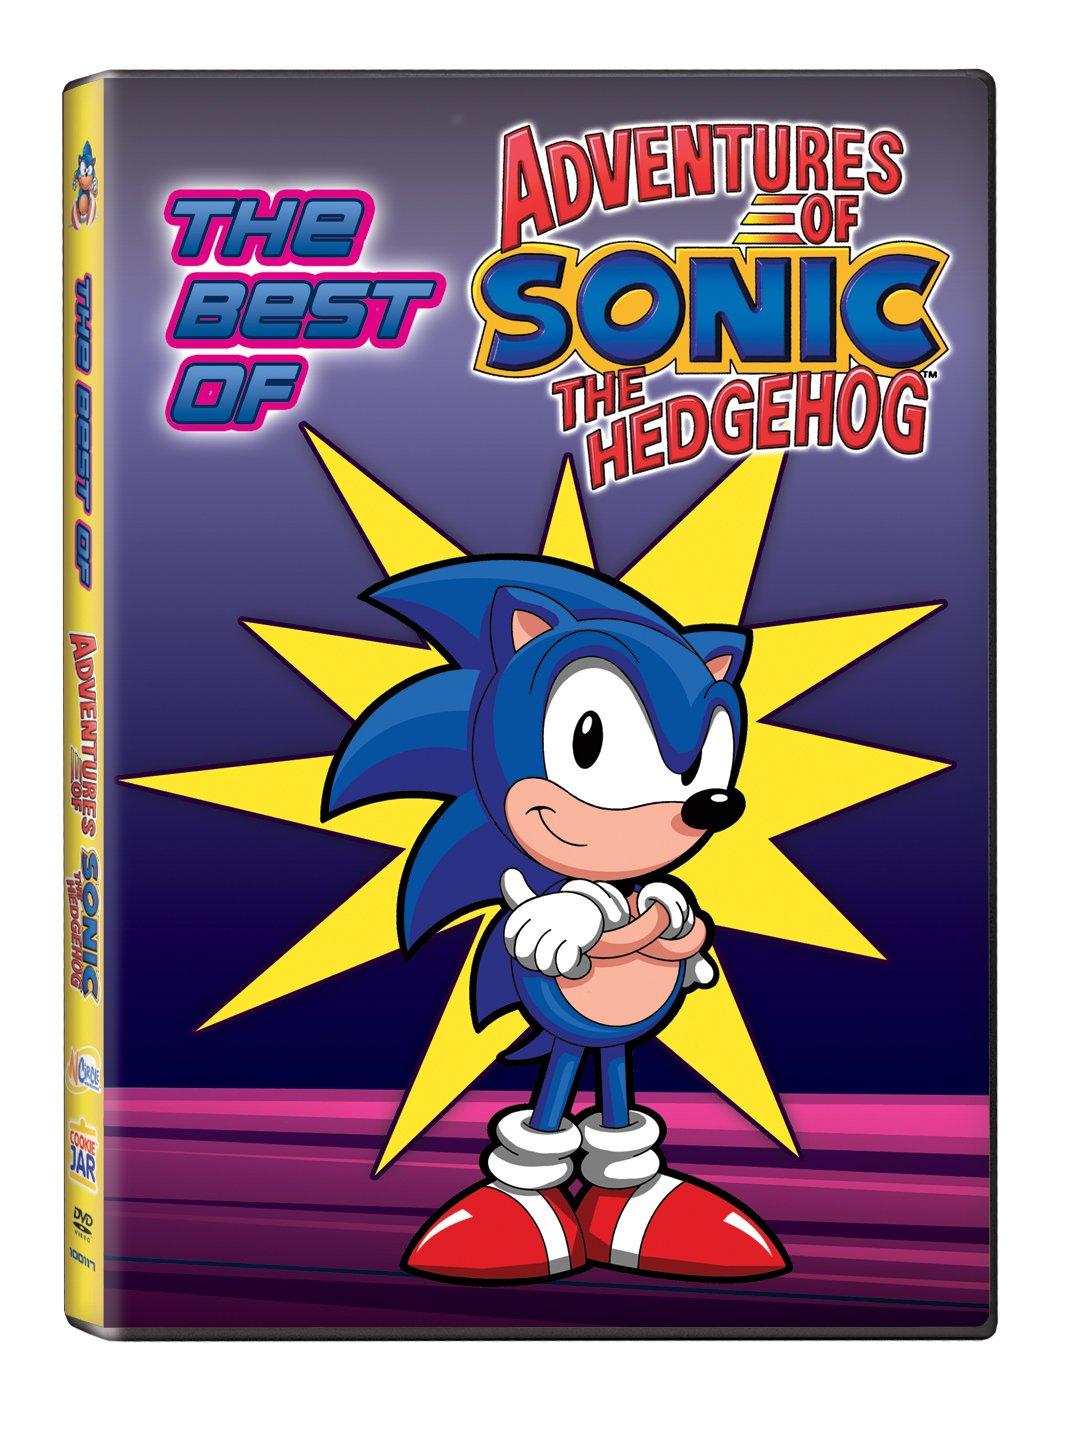 Amazon Com Best Of The Adventures Of Sonic The Hedgehog Sonic Sonic The Hedgehog Movies Tv